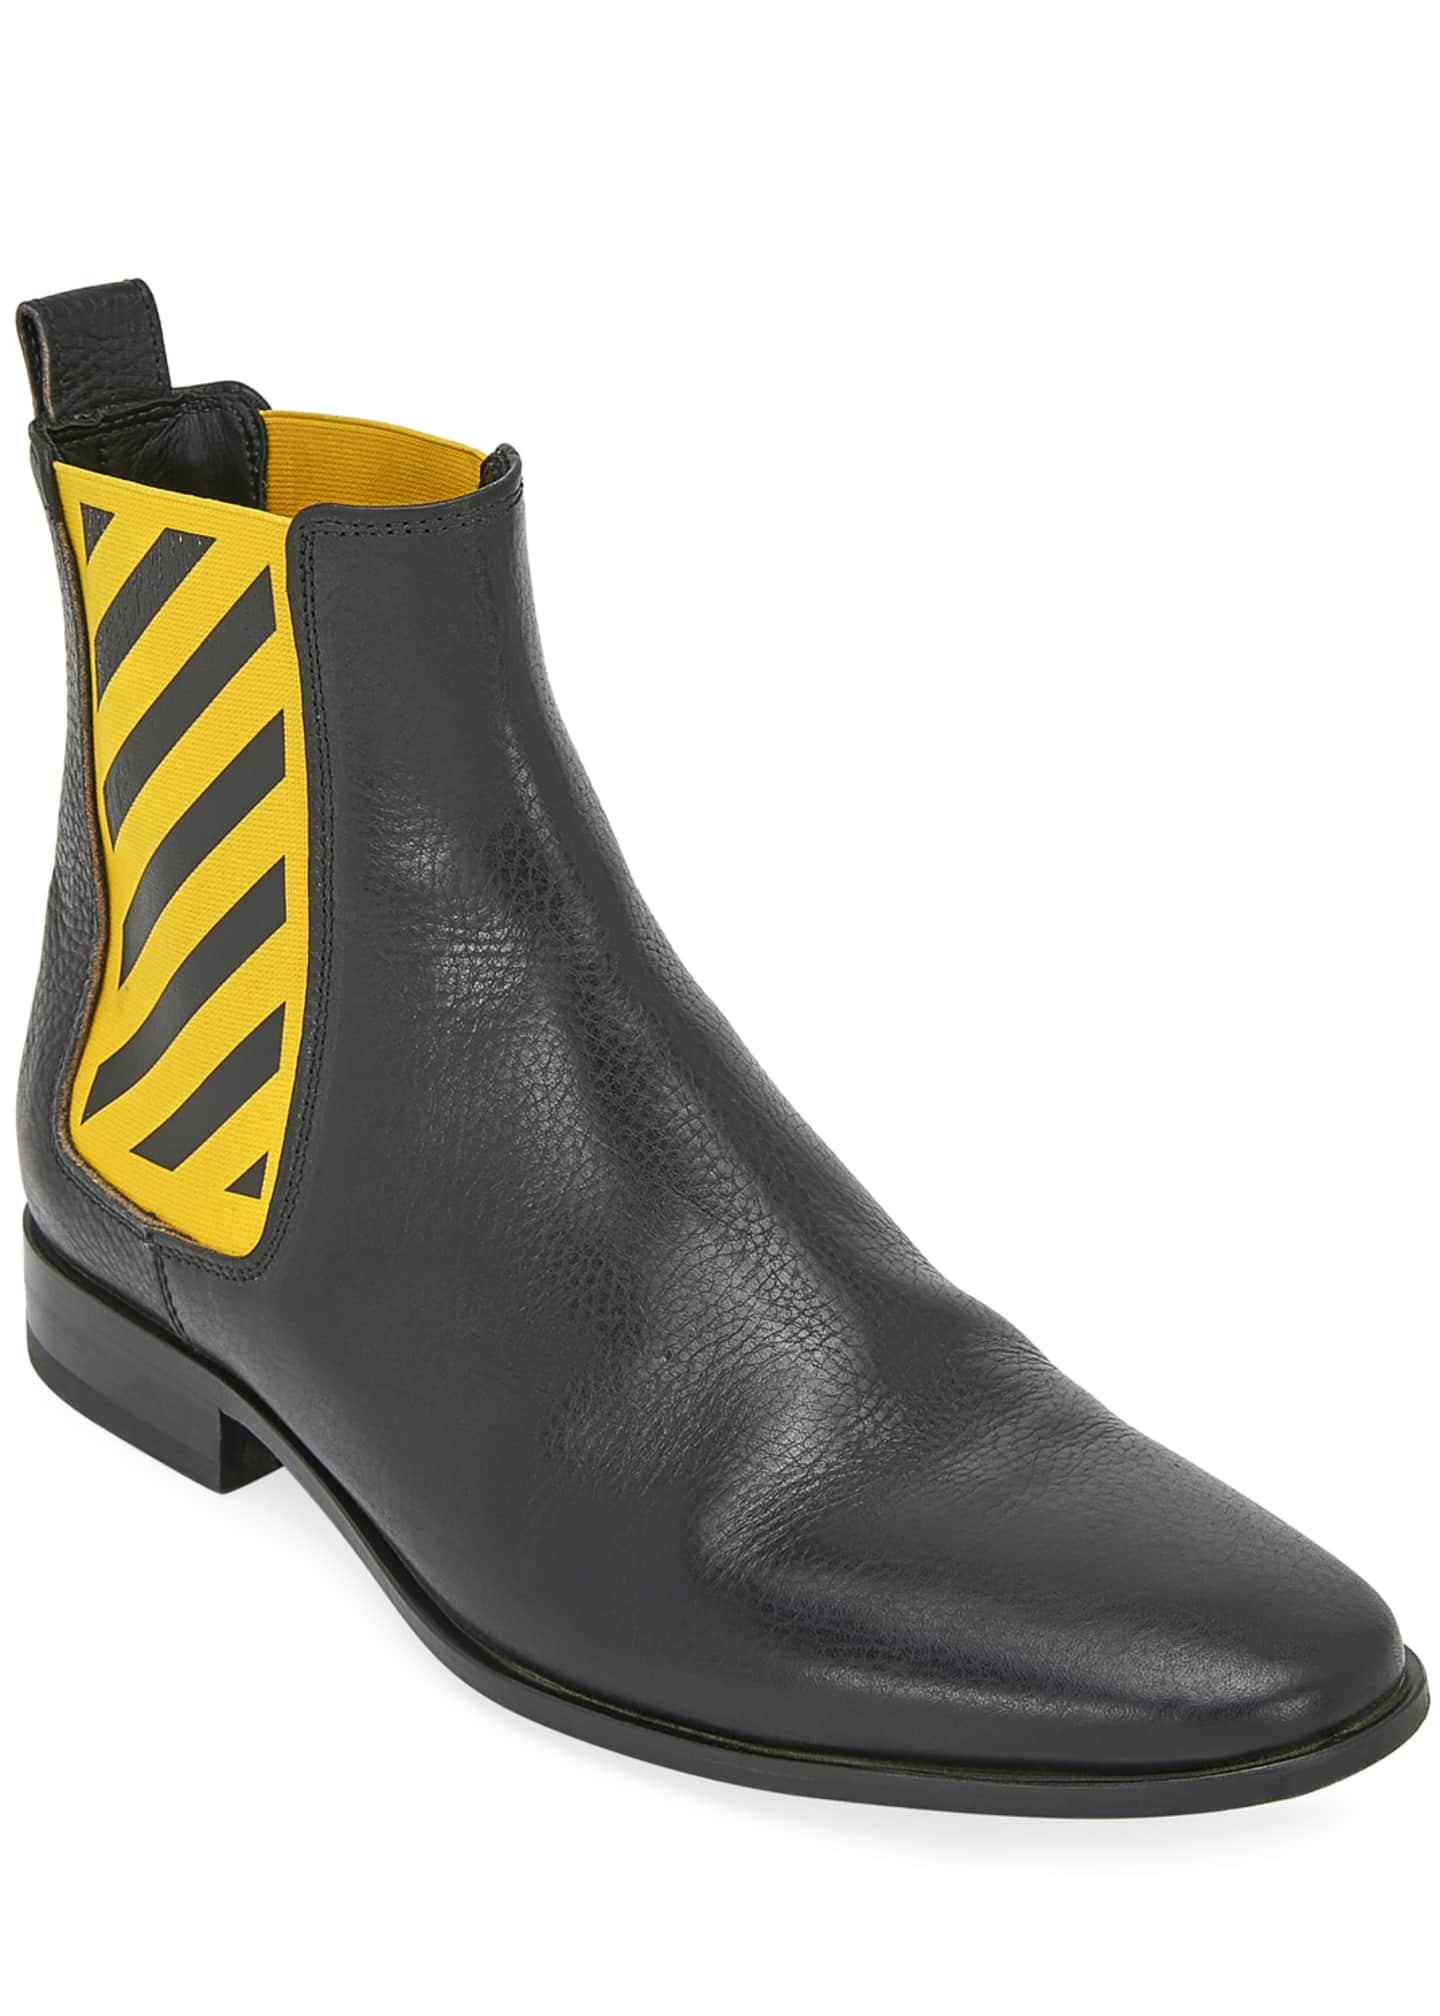 Off-White Men's Striped-Gore Leather Chelsea Boot